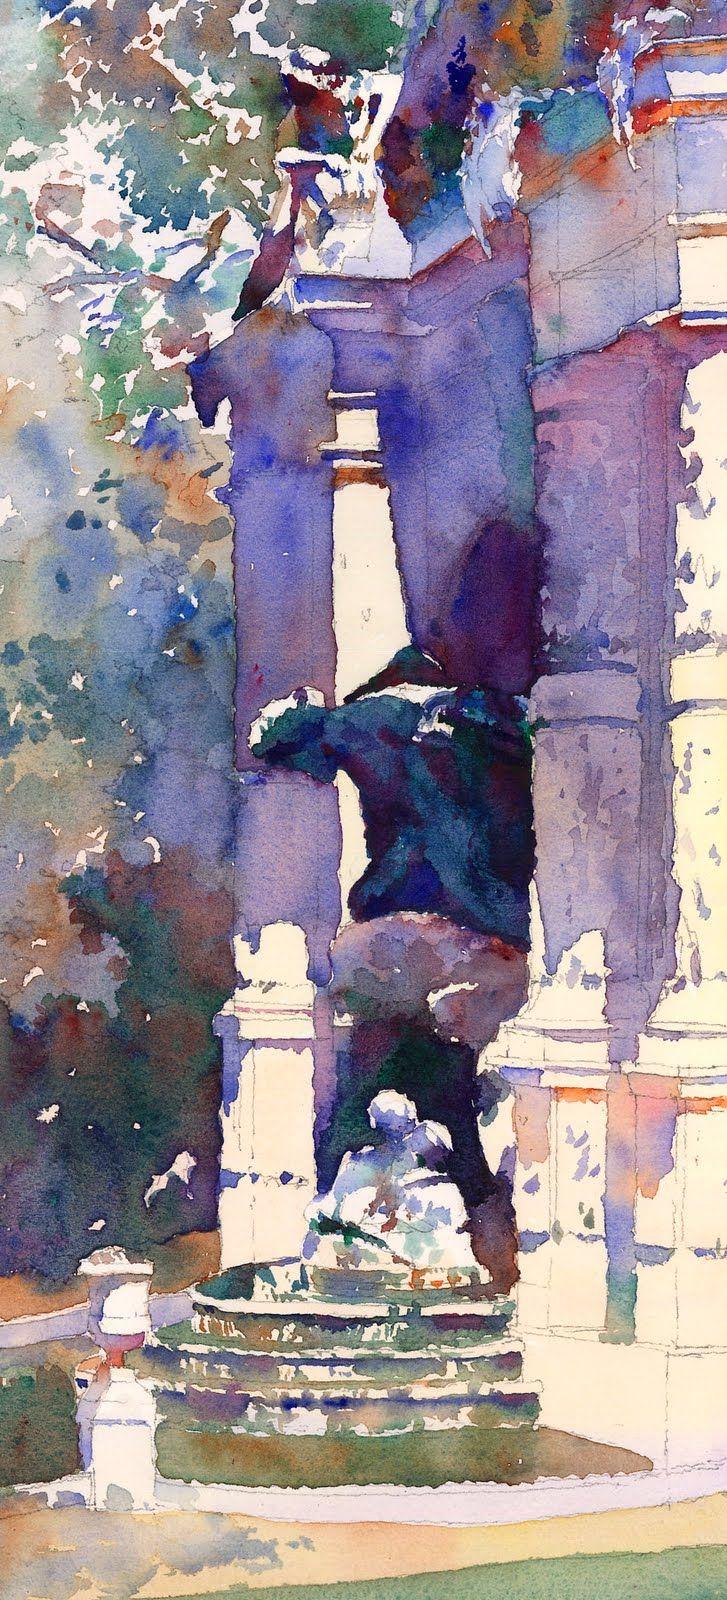 Michael Reardon WATERCOLOR Paris, France #watercolor jd